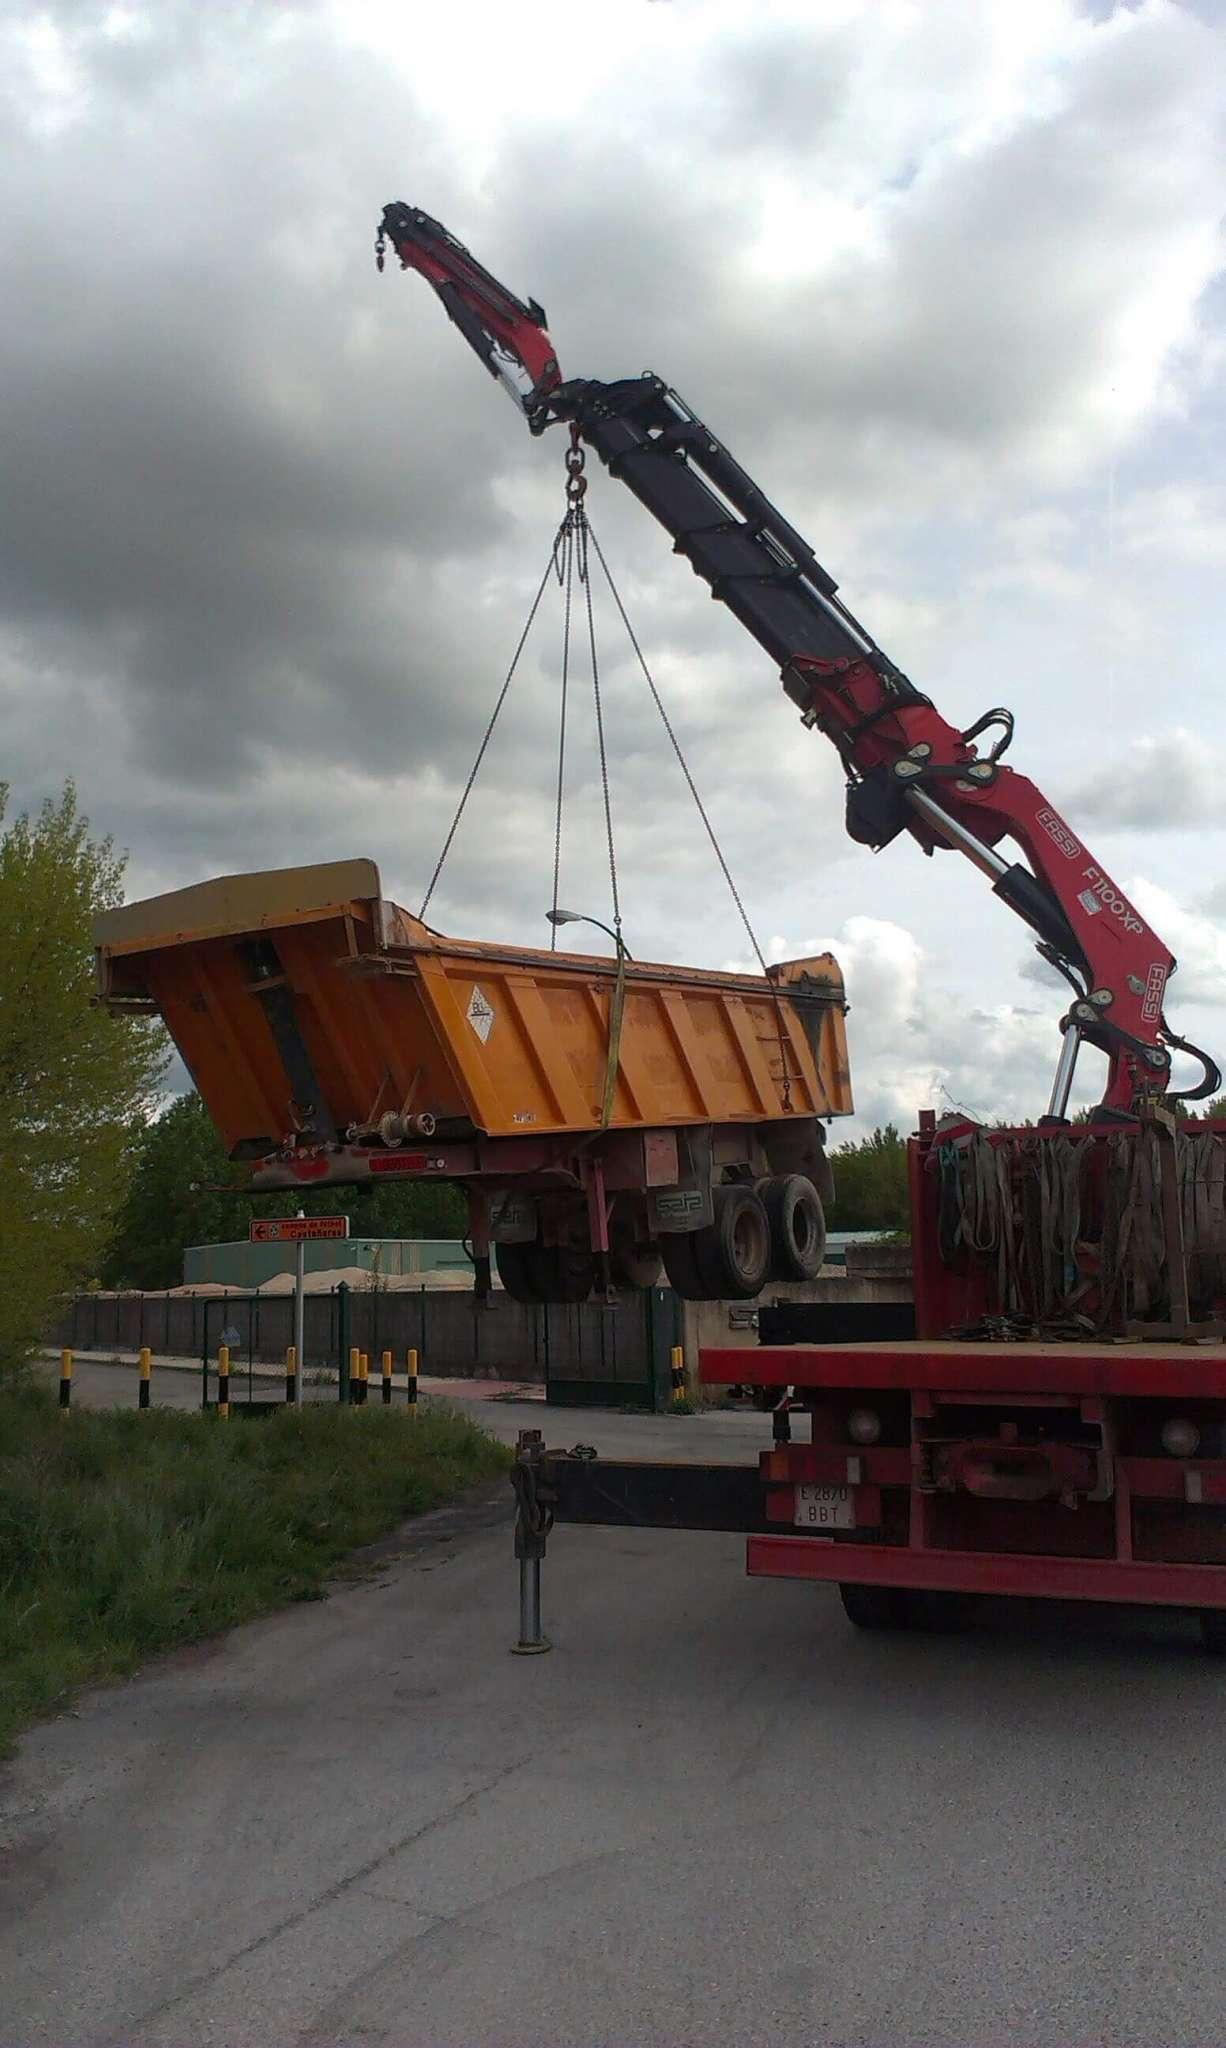 Servicio camión grúa articulada en Burgos